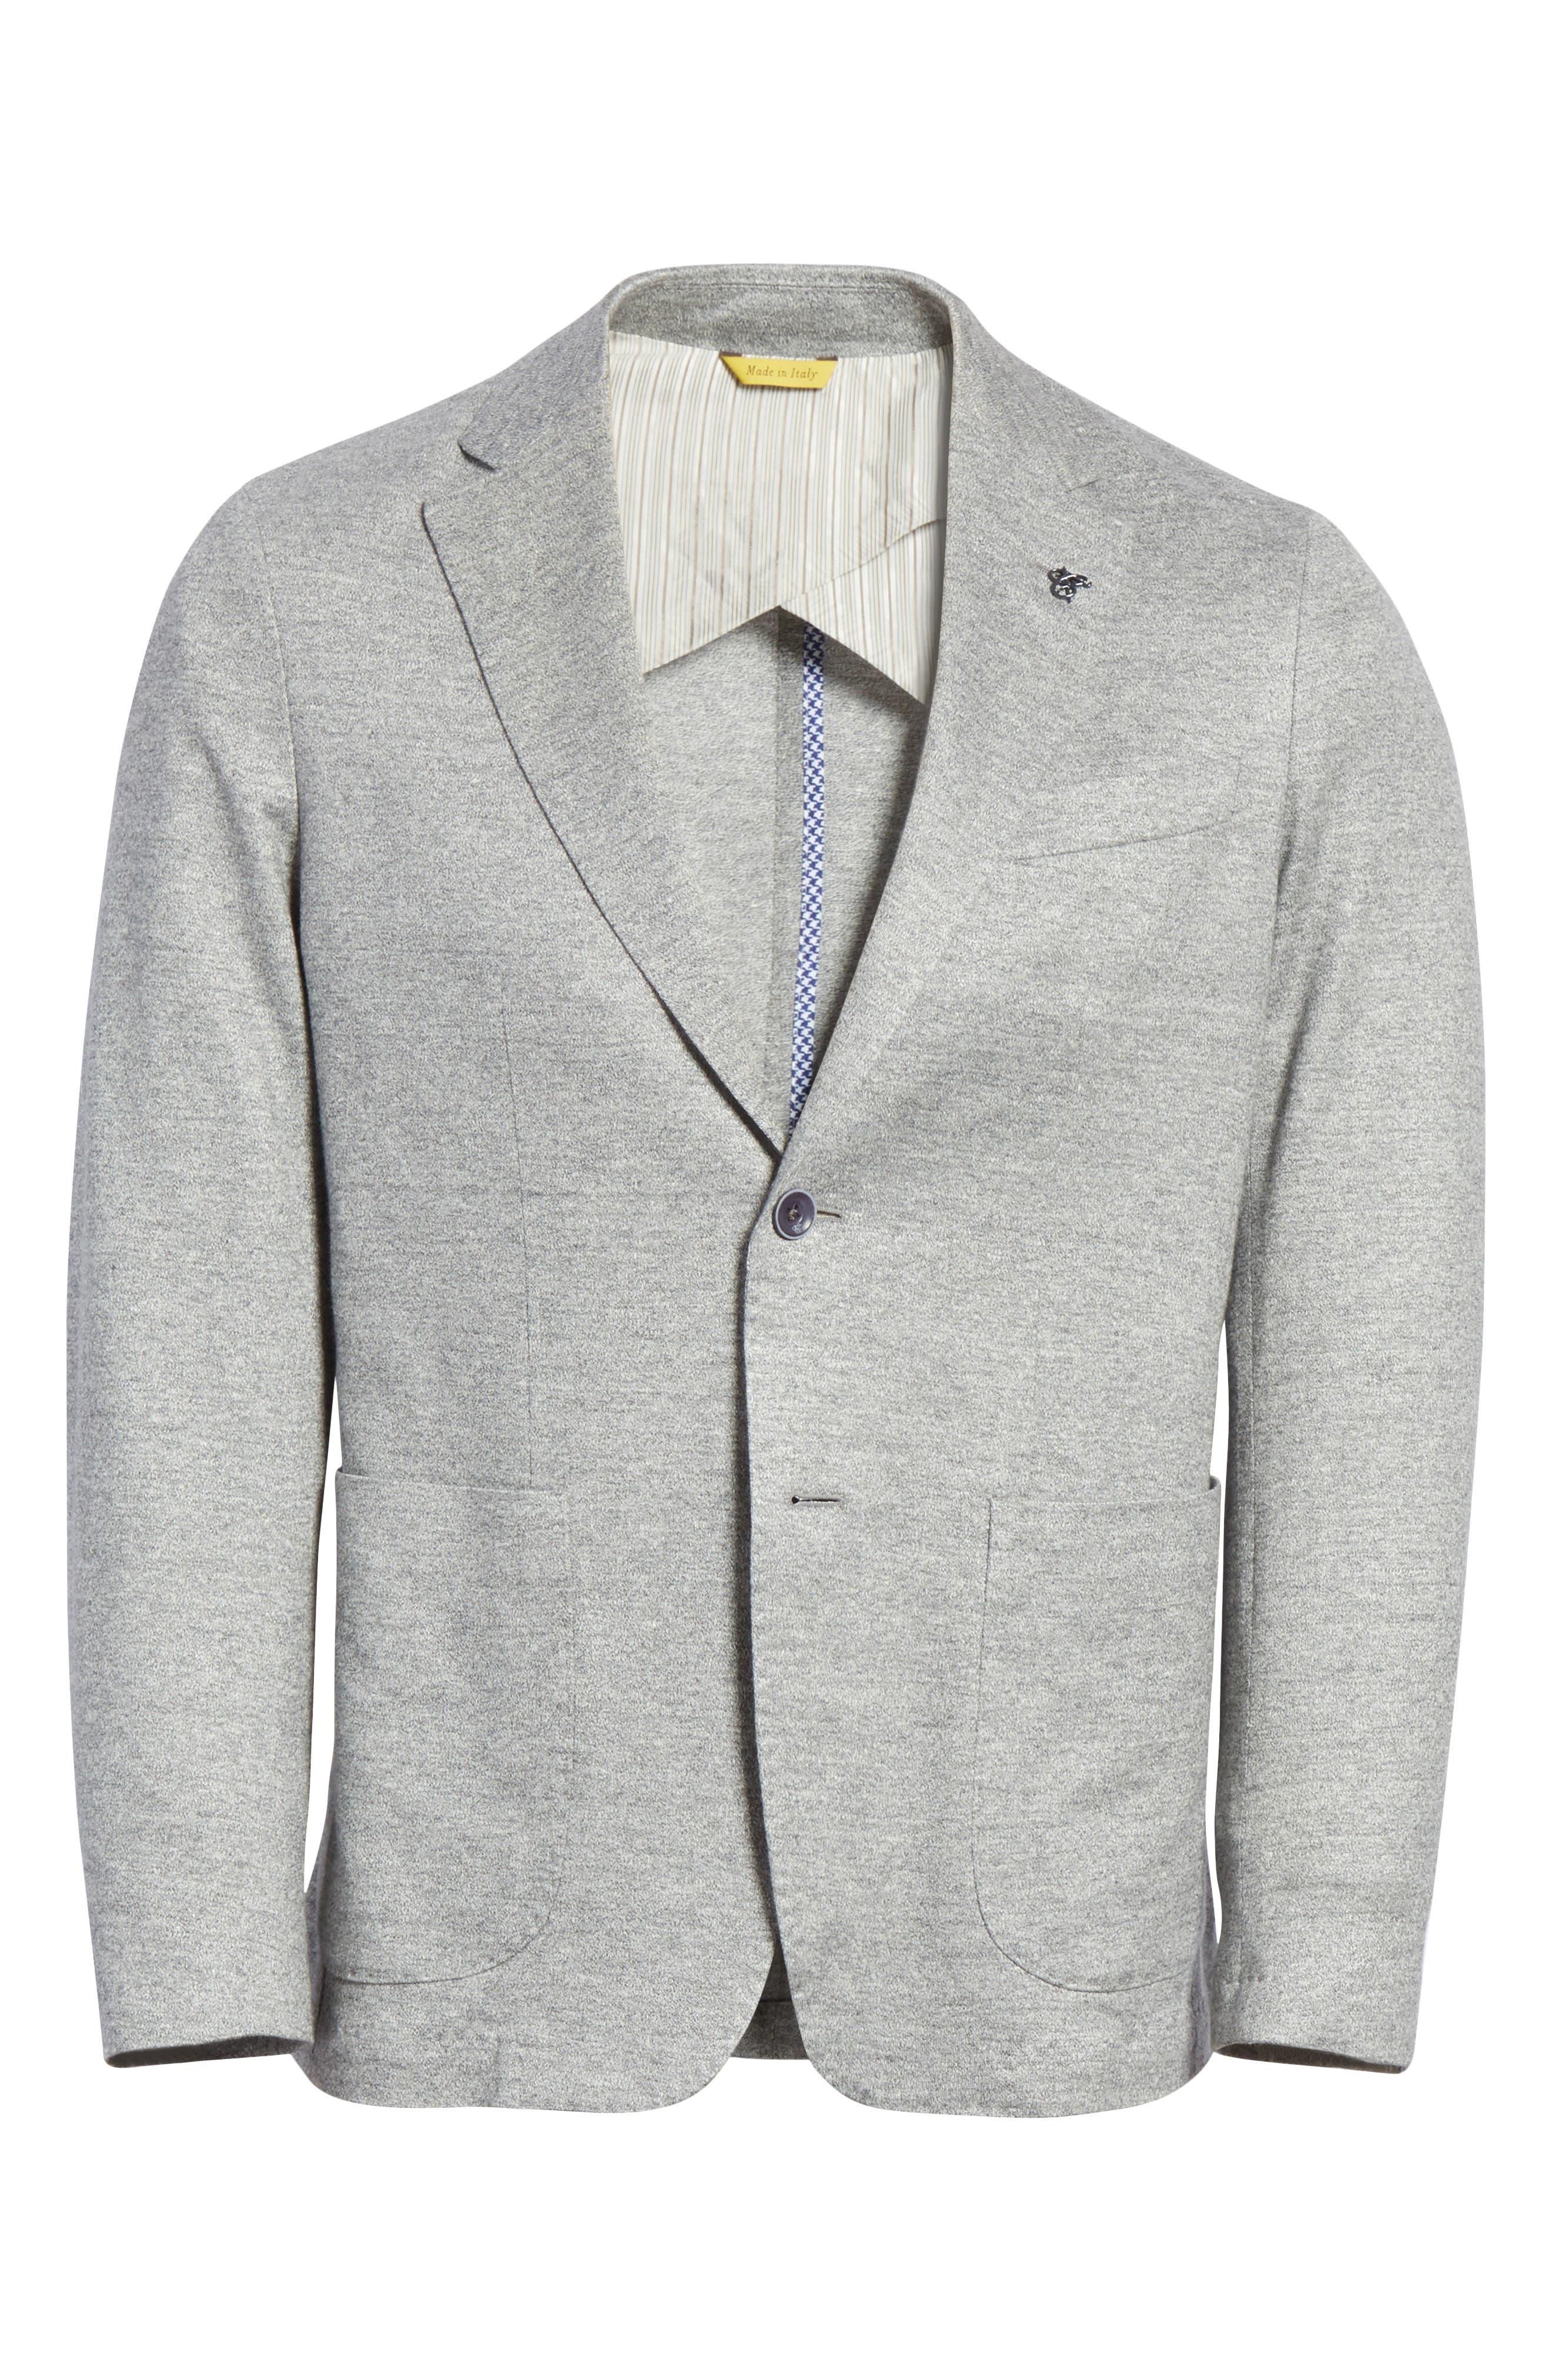 Trim Fit Washed Jersey Jacket,                             Alternate thumbnail 5, color,                             050